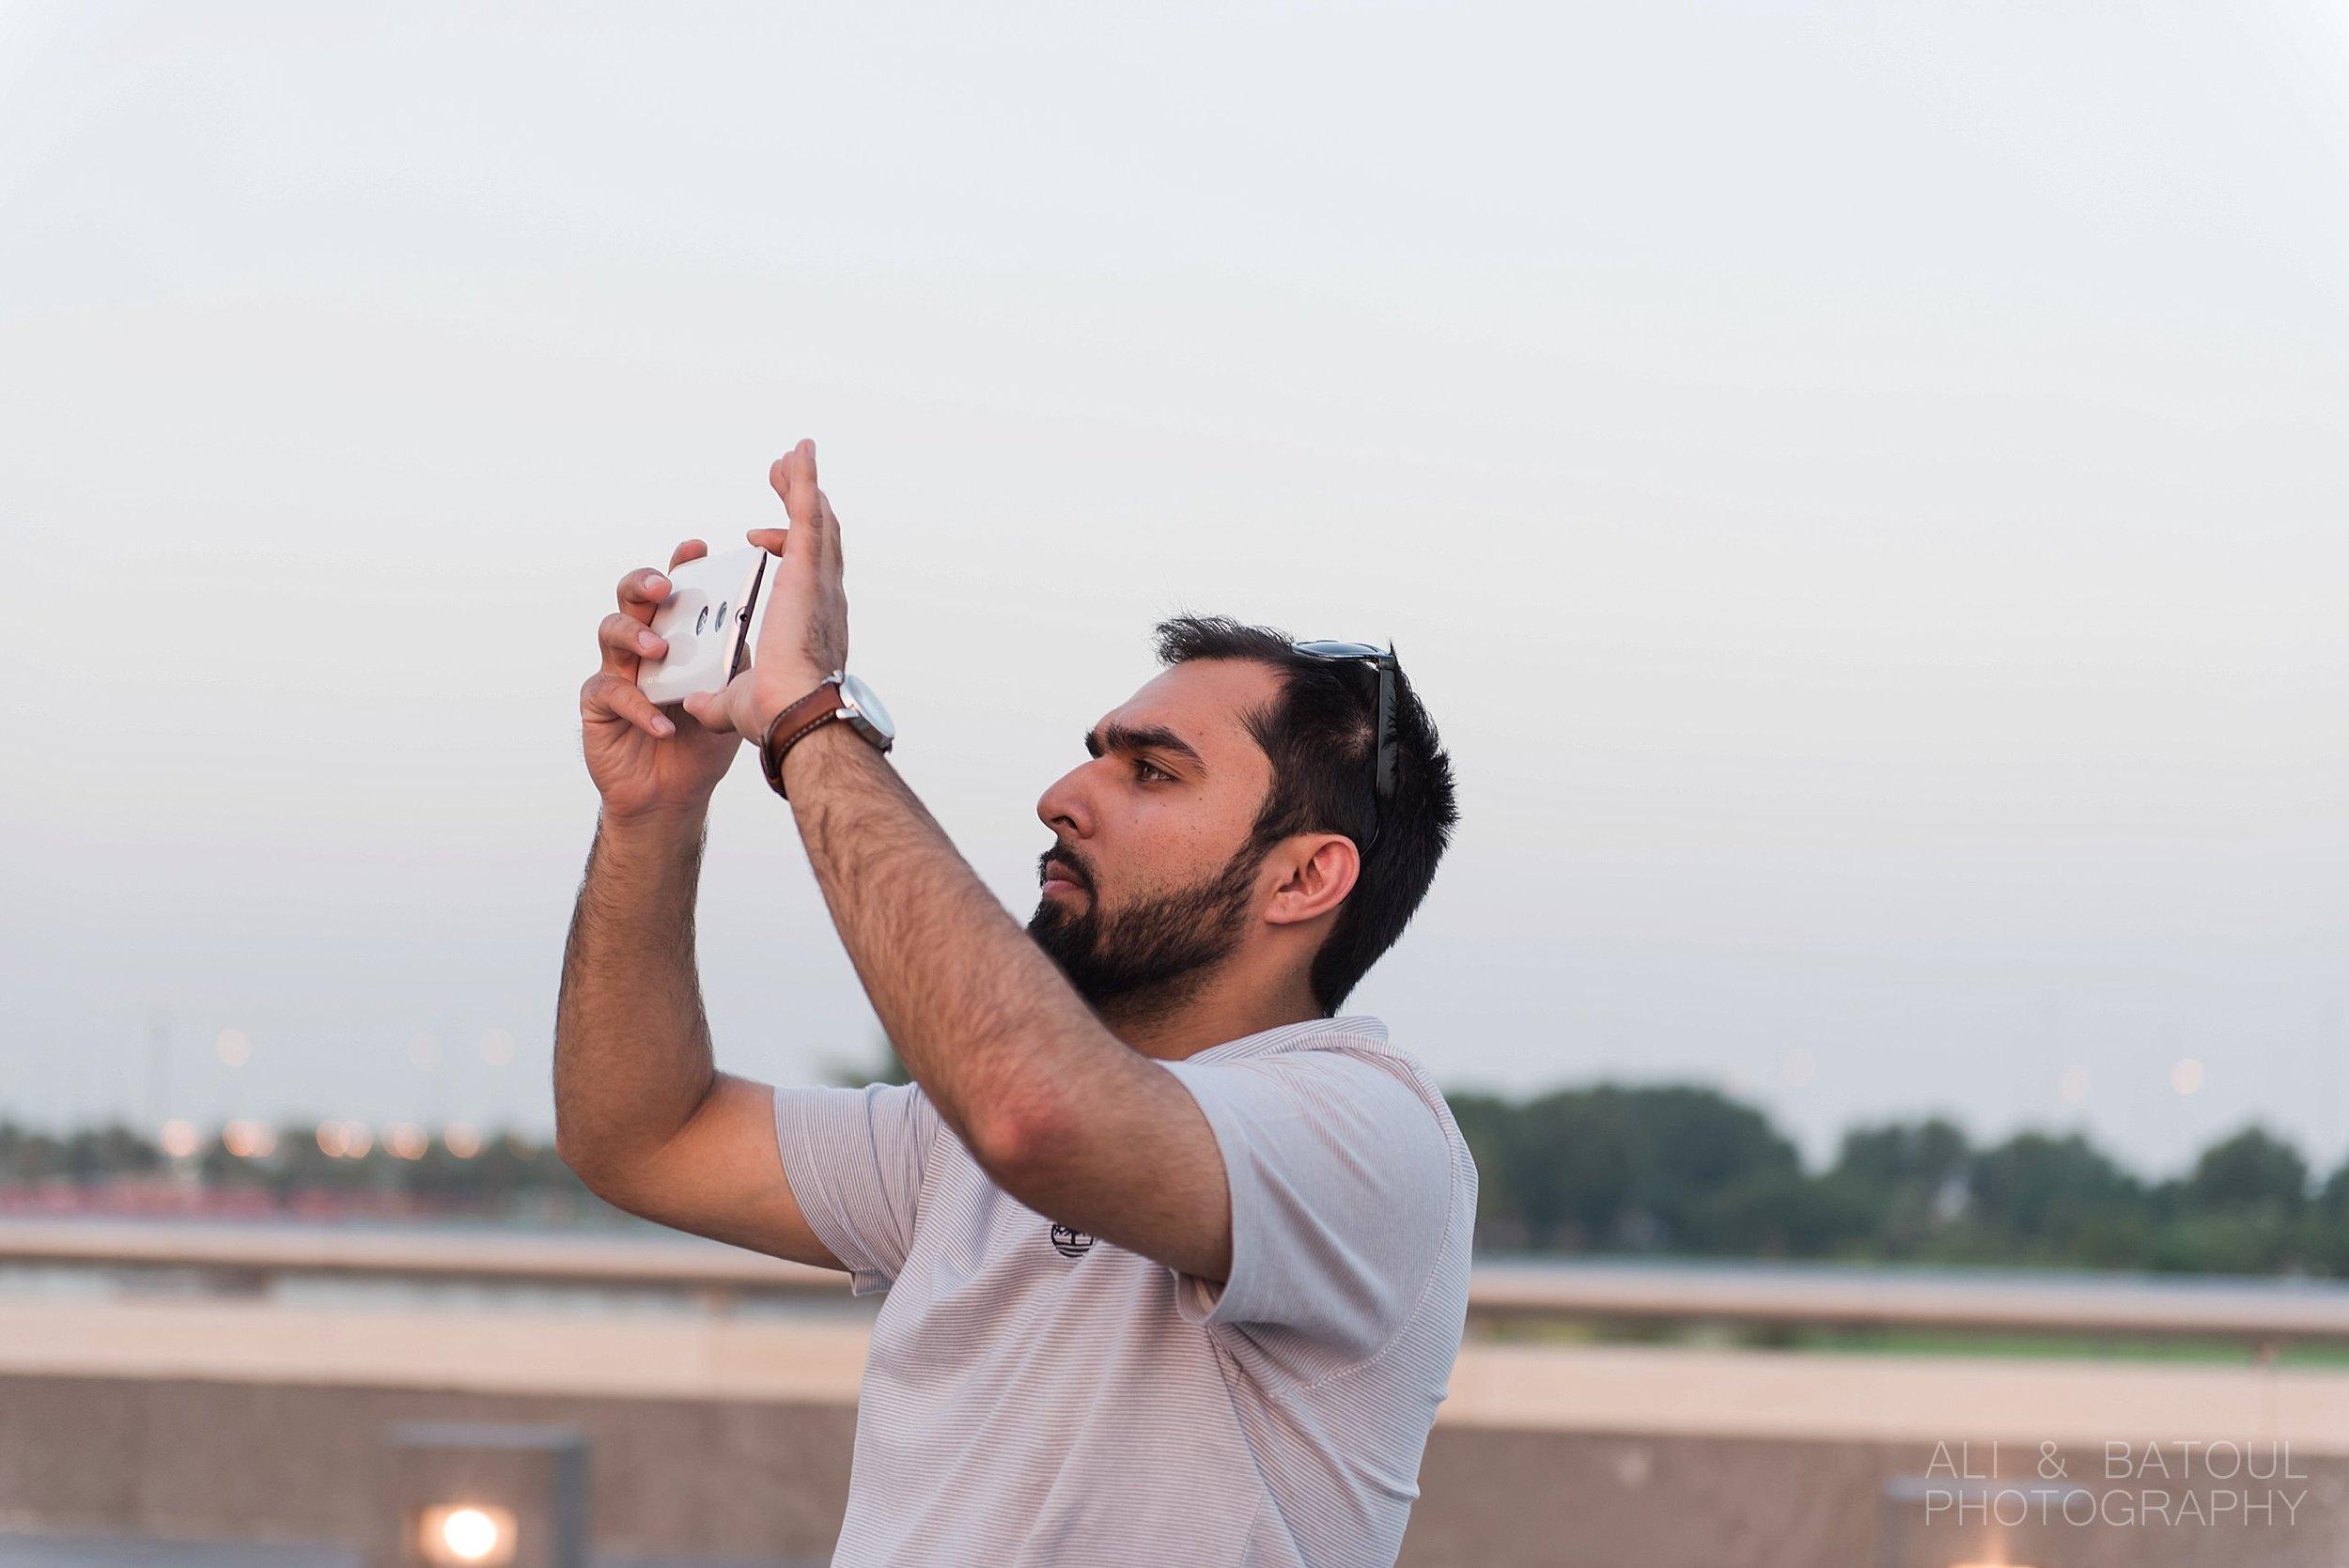 Ali & Batoul Photography - Doha Travel Photography_0006.jpg